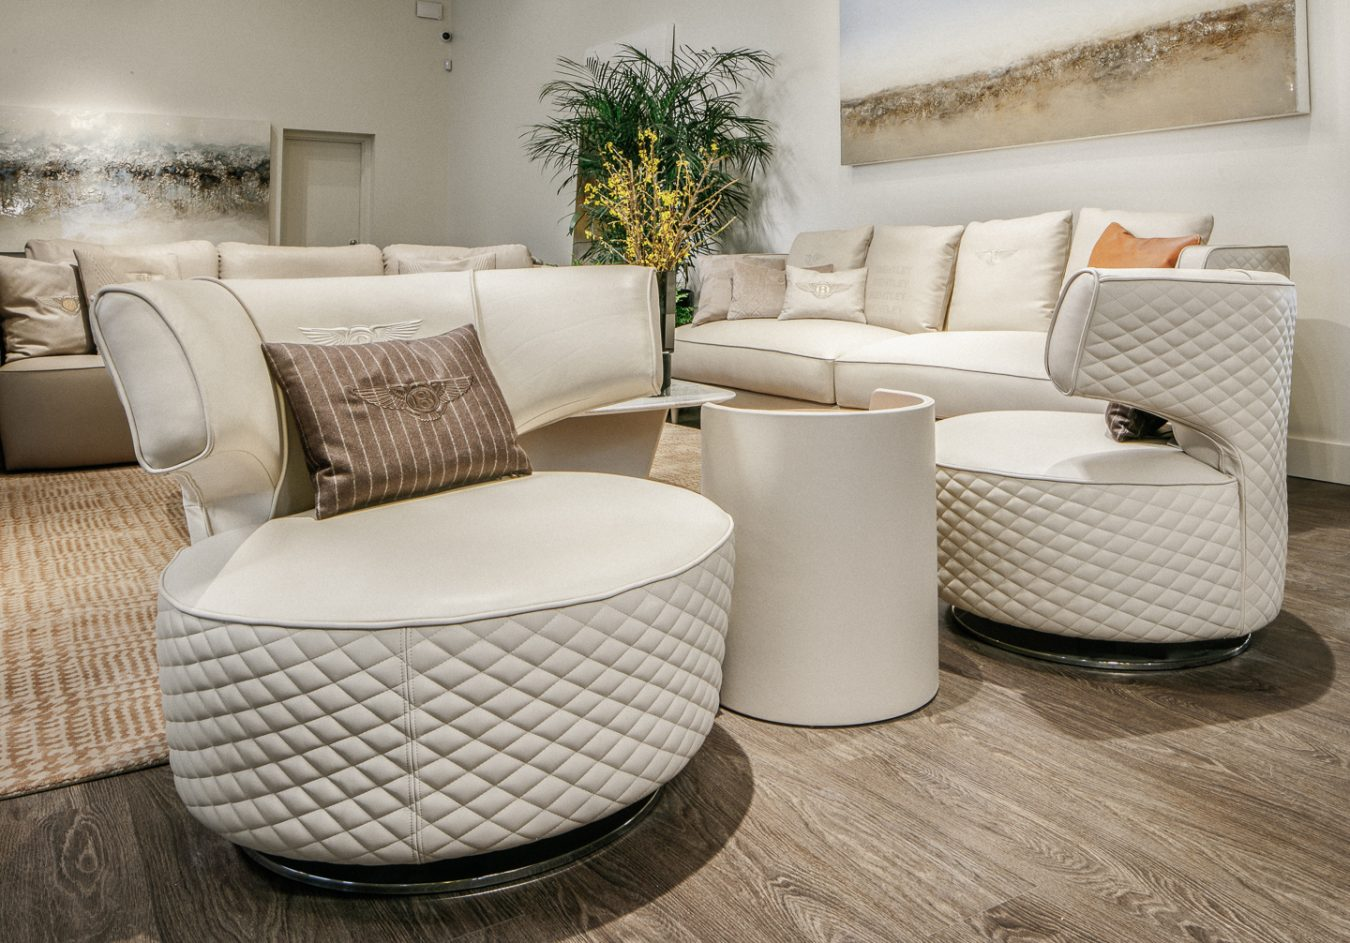 Fendi casa and bentley home in vancouver montecristo for Home arredamento